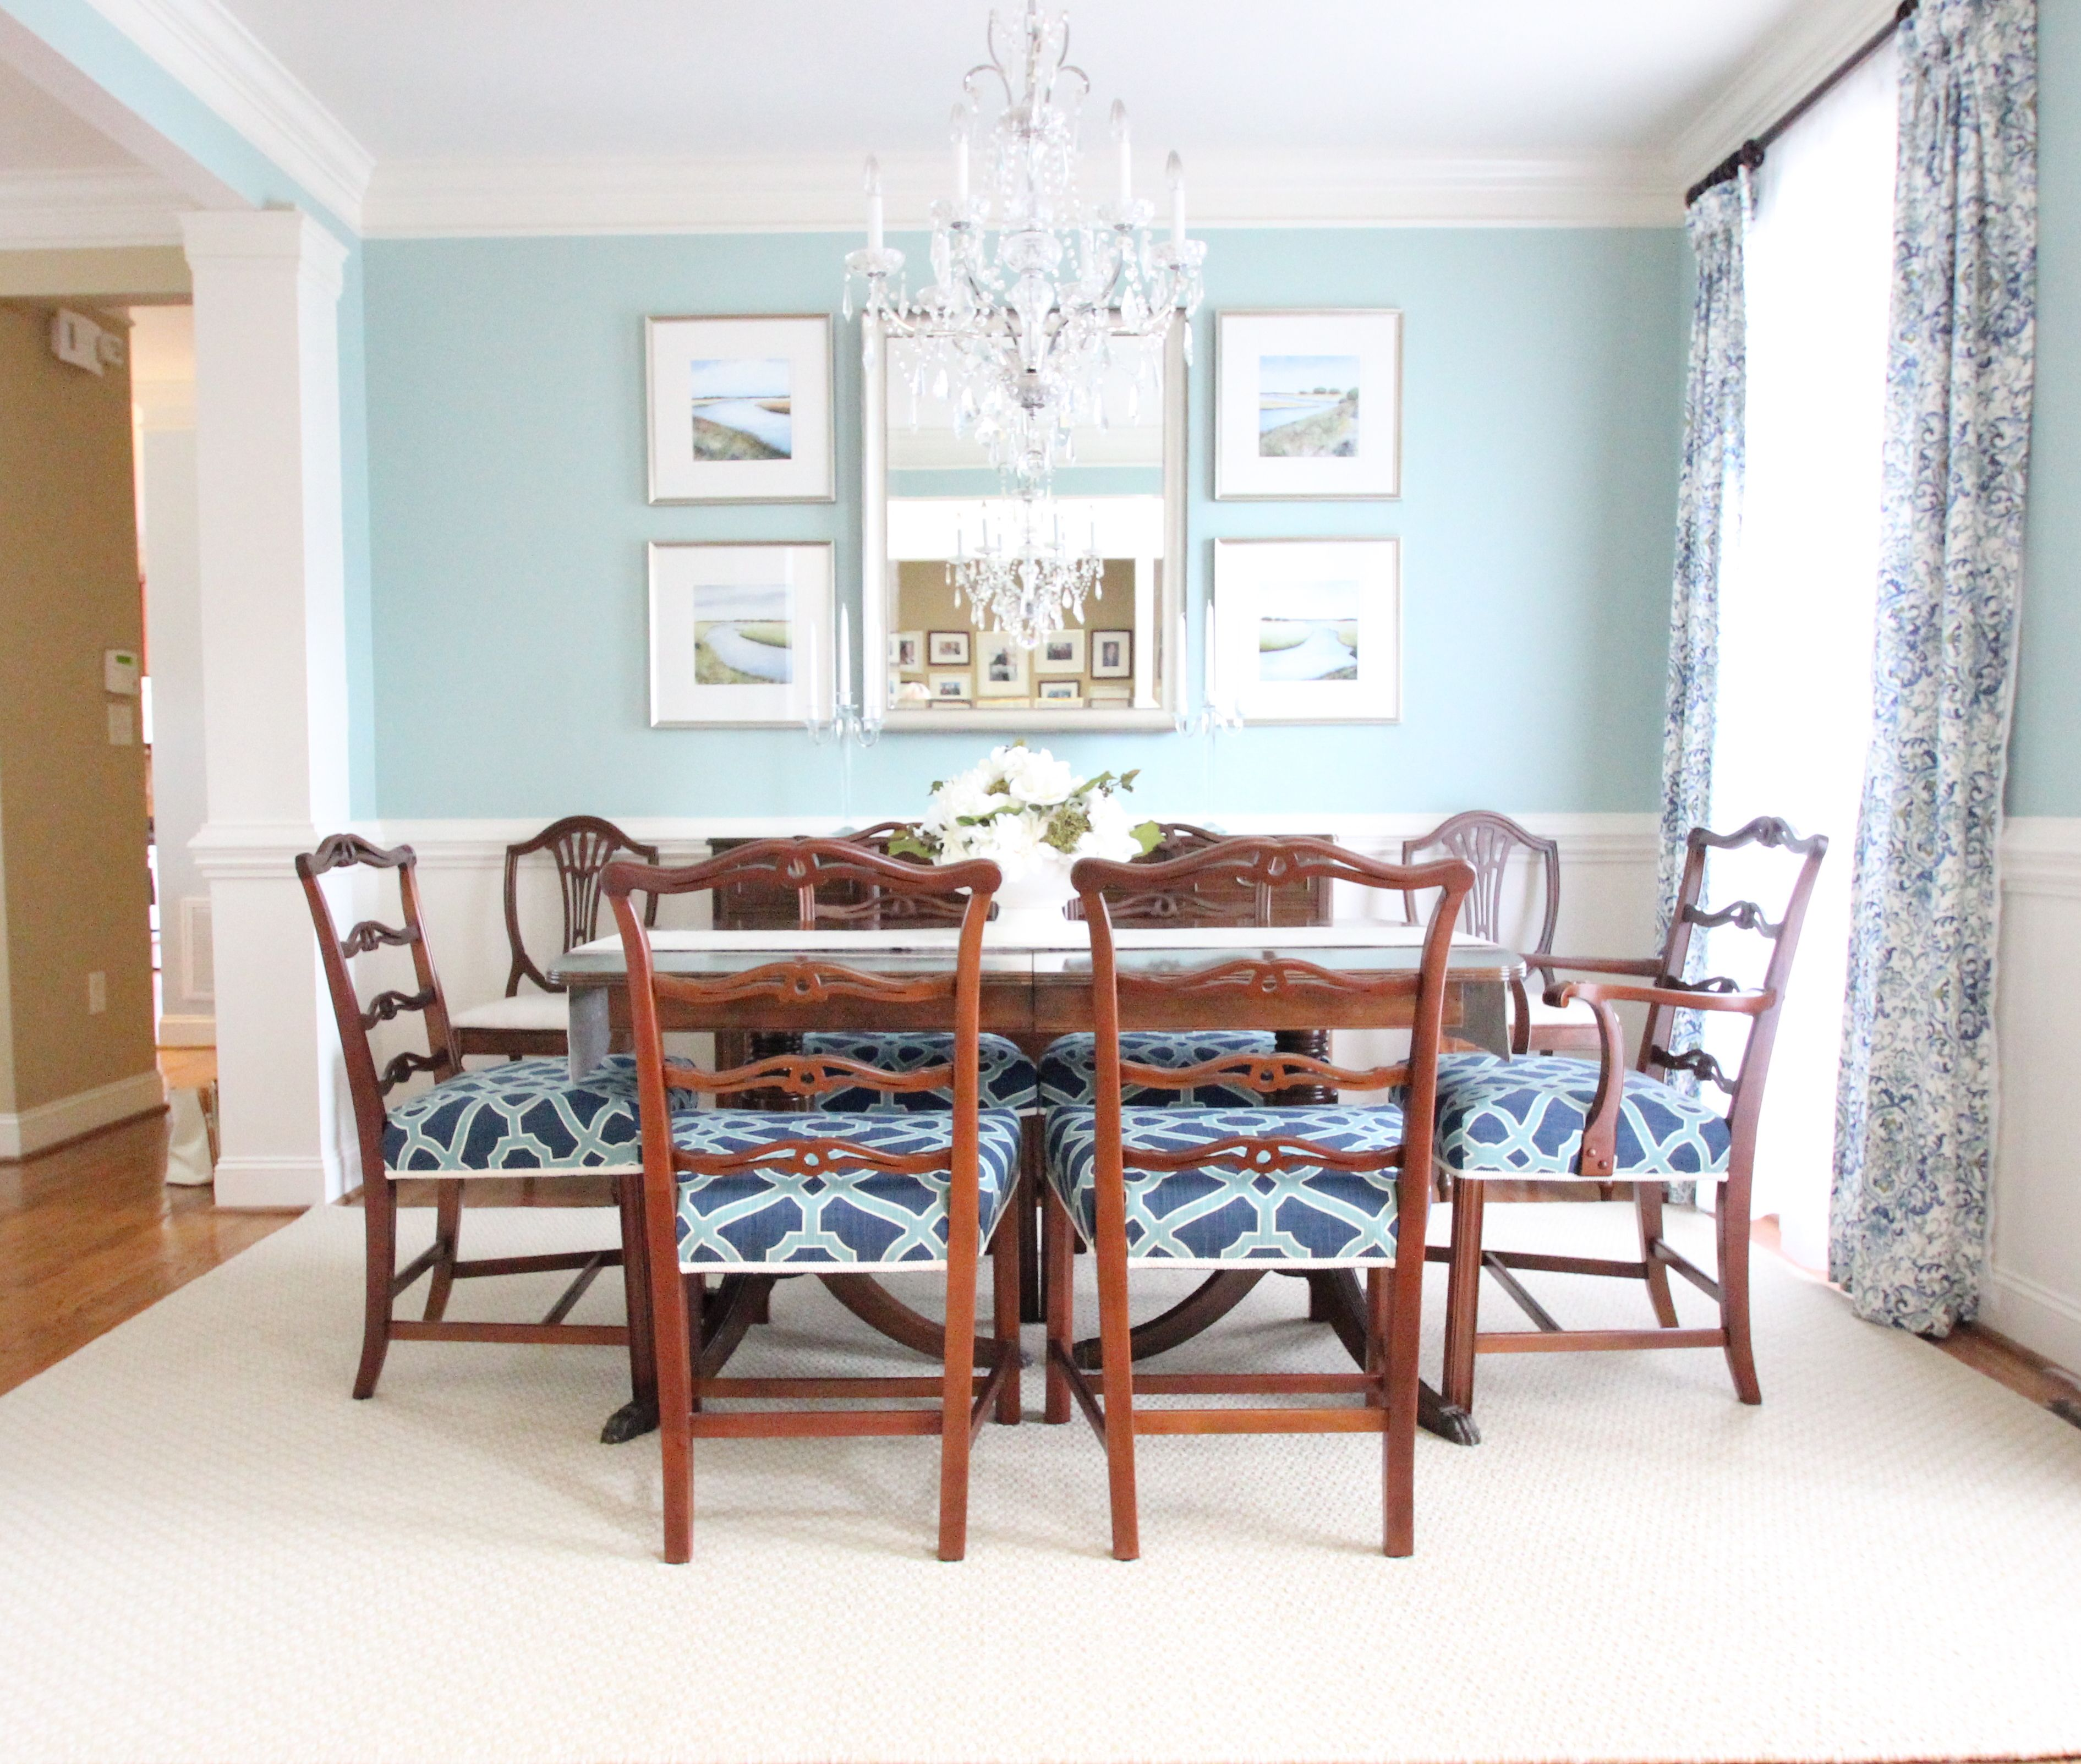 Favorite Spa Blue Paint Colors 2016  Indigo Paint Colors And Colors Unique Blue Green Dining Room Decorating Inspiration